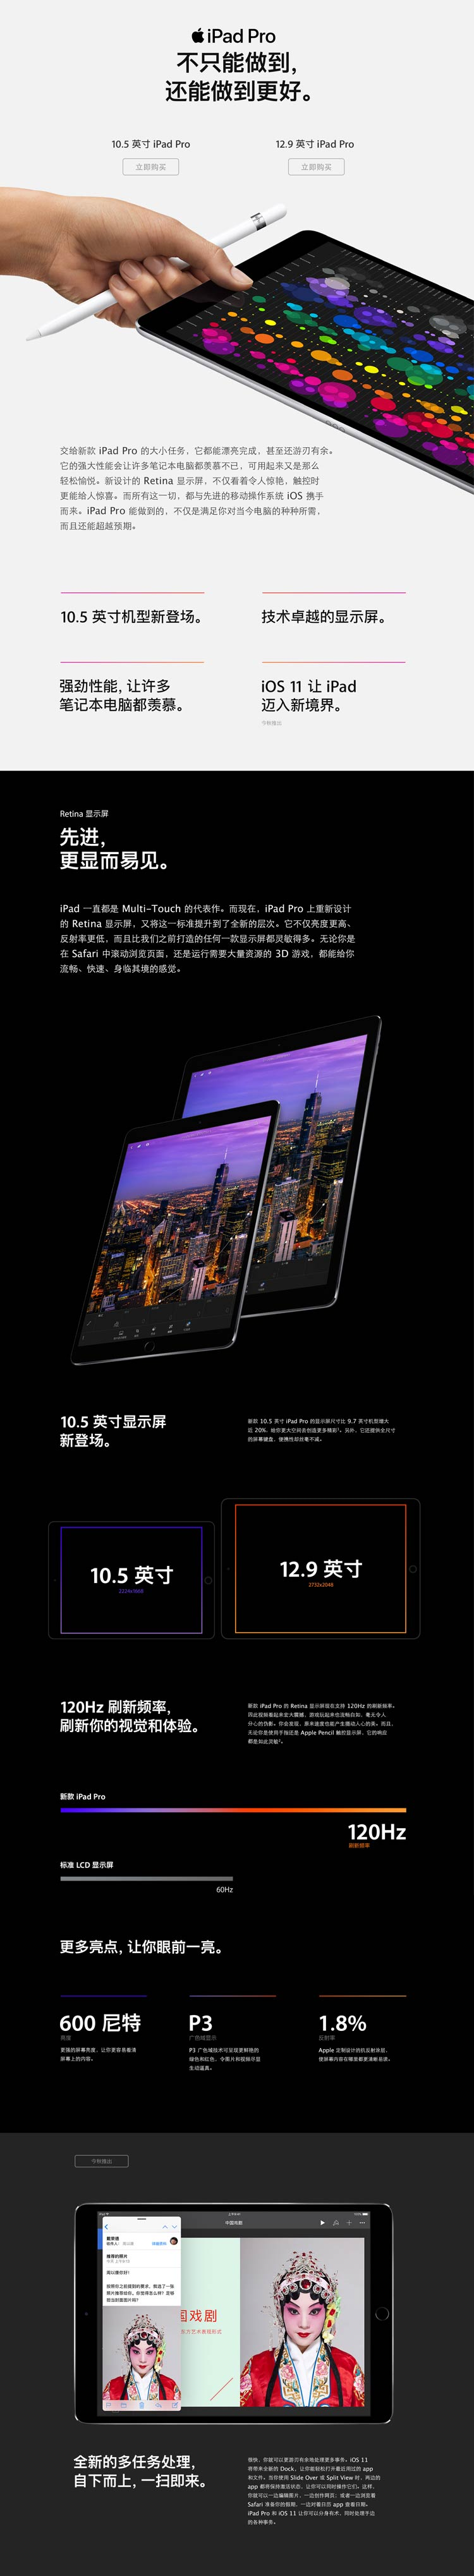 Apple iPad Pro 平板电脑 12.9英寸